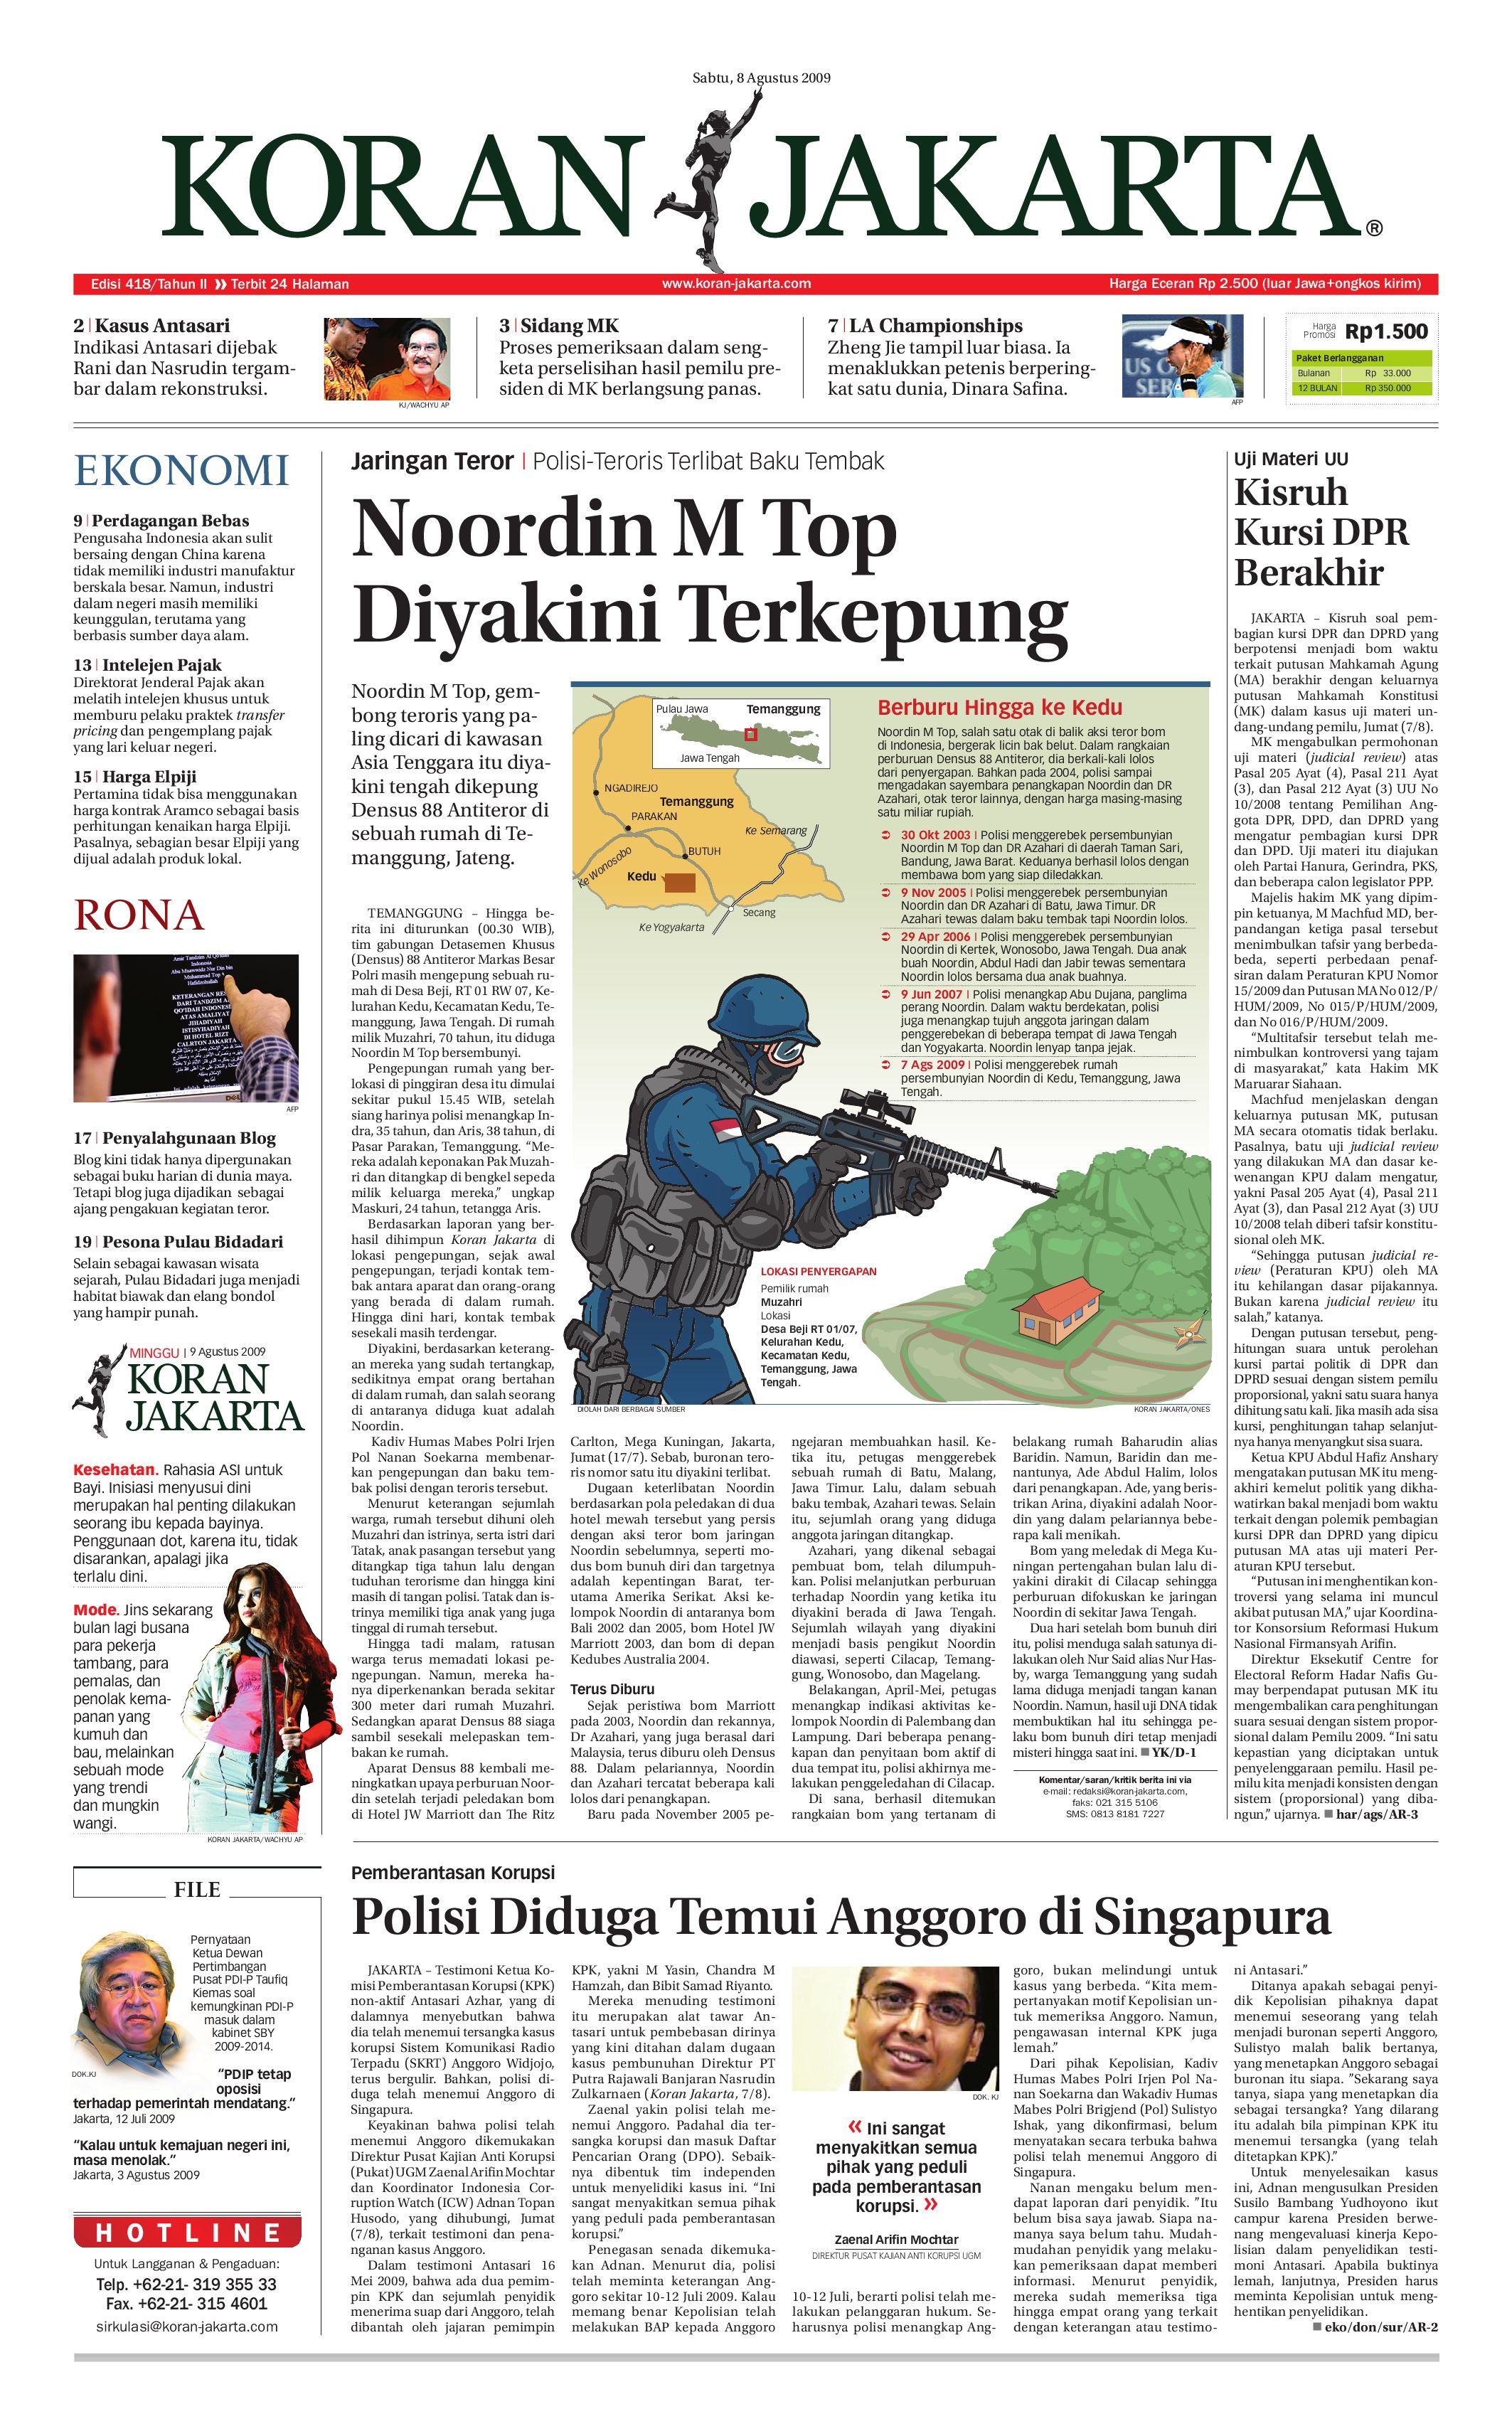 Edisi 418 08 Agustus 2009 By Pt Berita Nusantara Issuu Produk Ukm Bumn Tenun Pagatan Kemeja Pria Biru Kapal